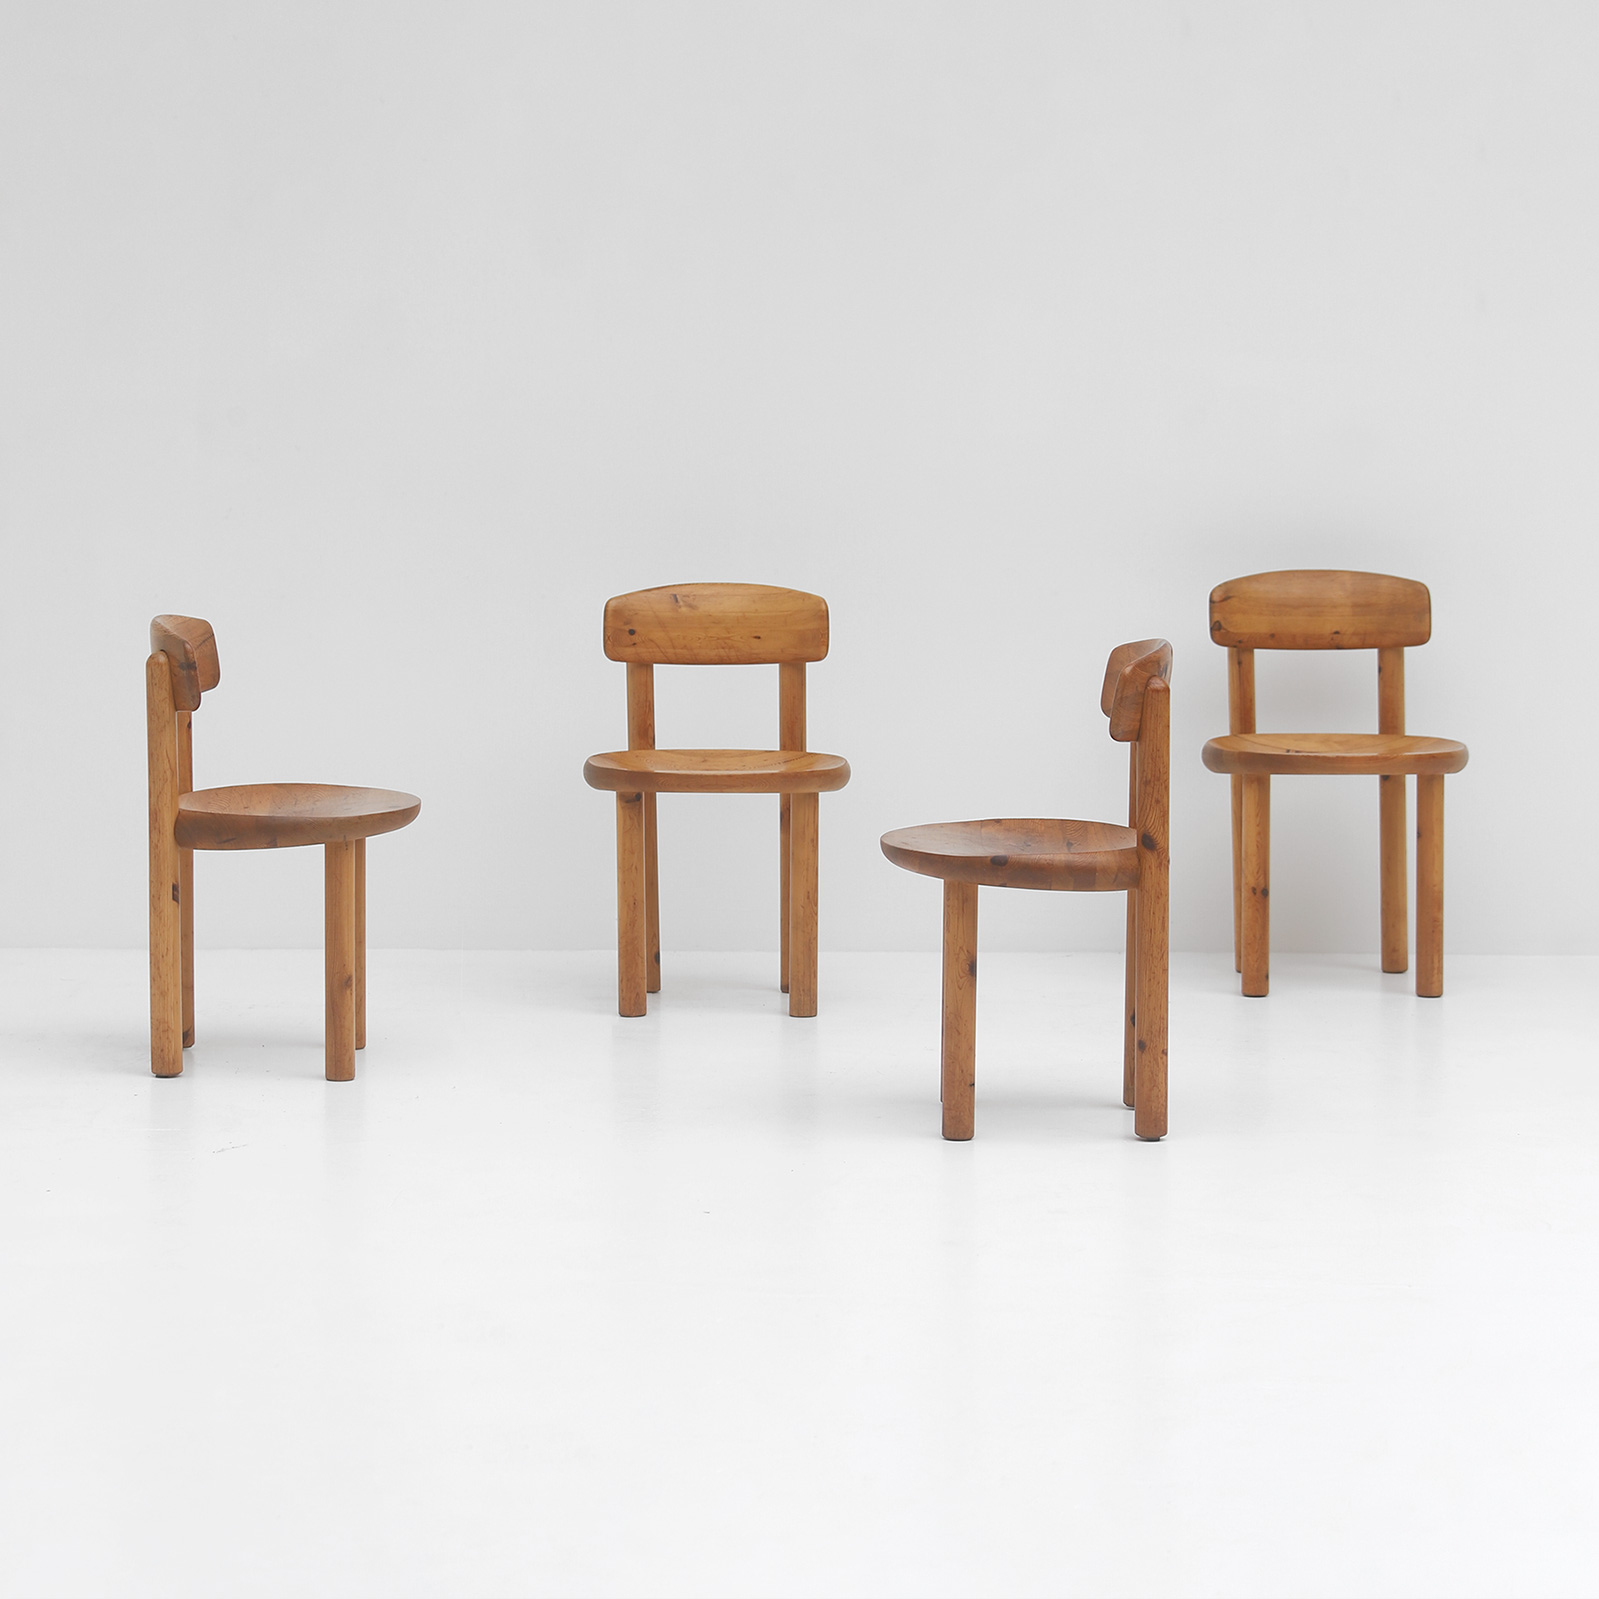 5 Daumiller Pinewood Chairs